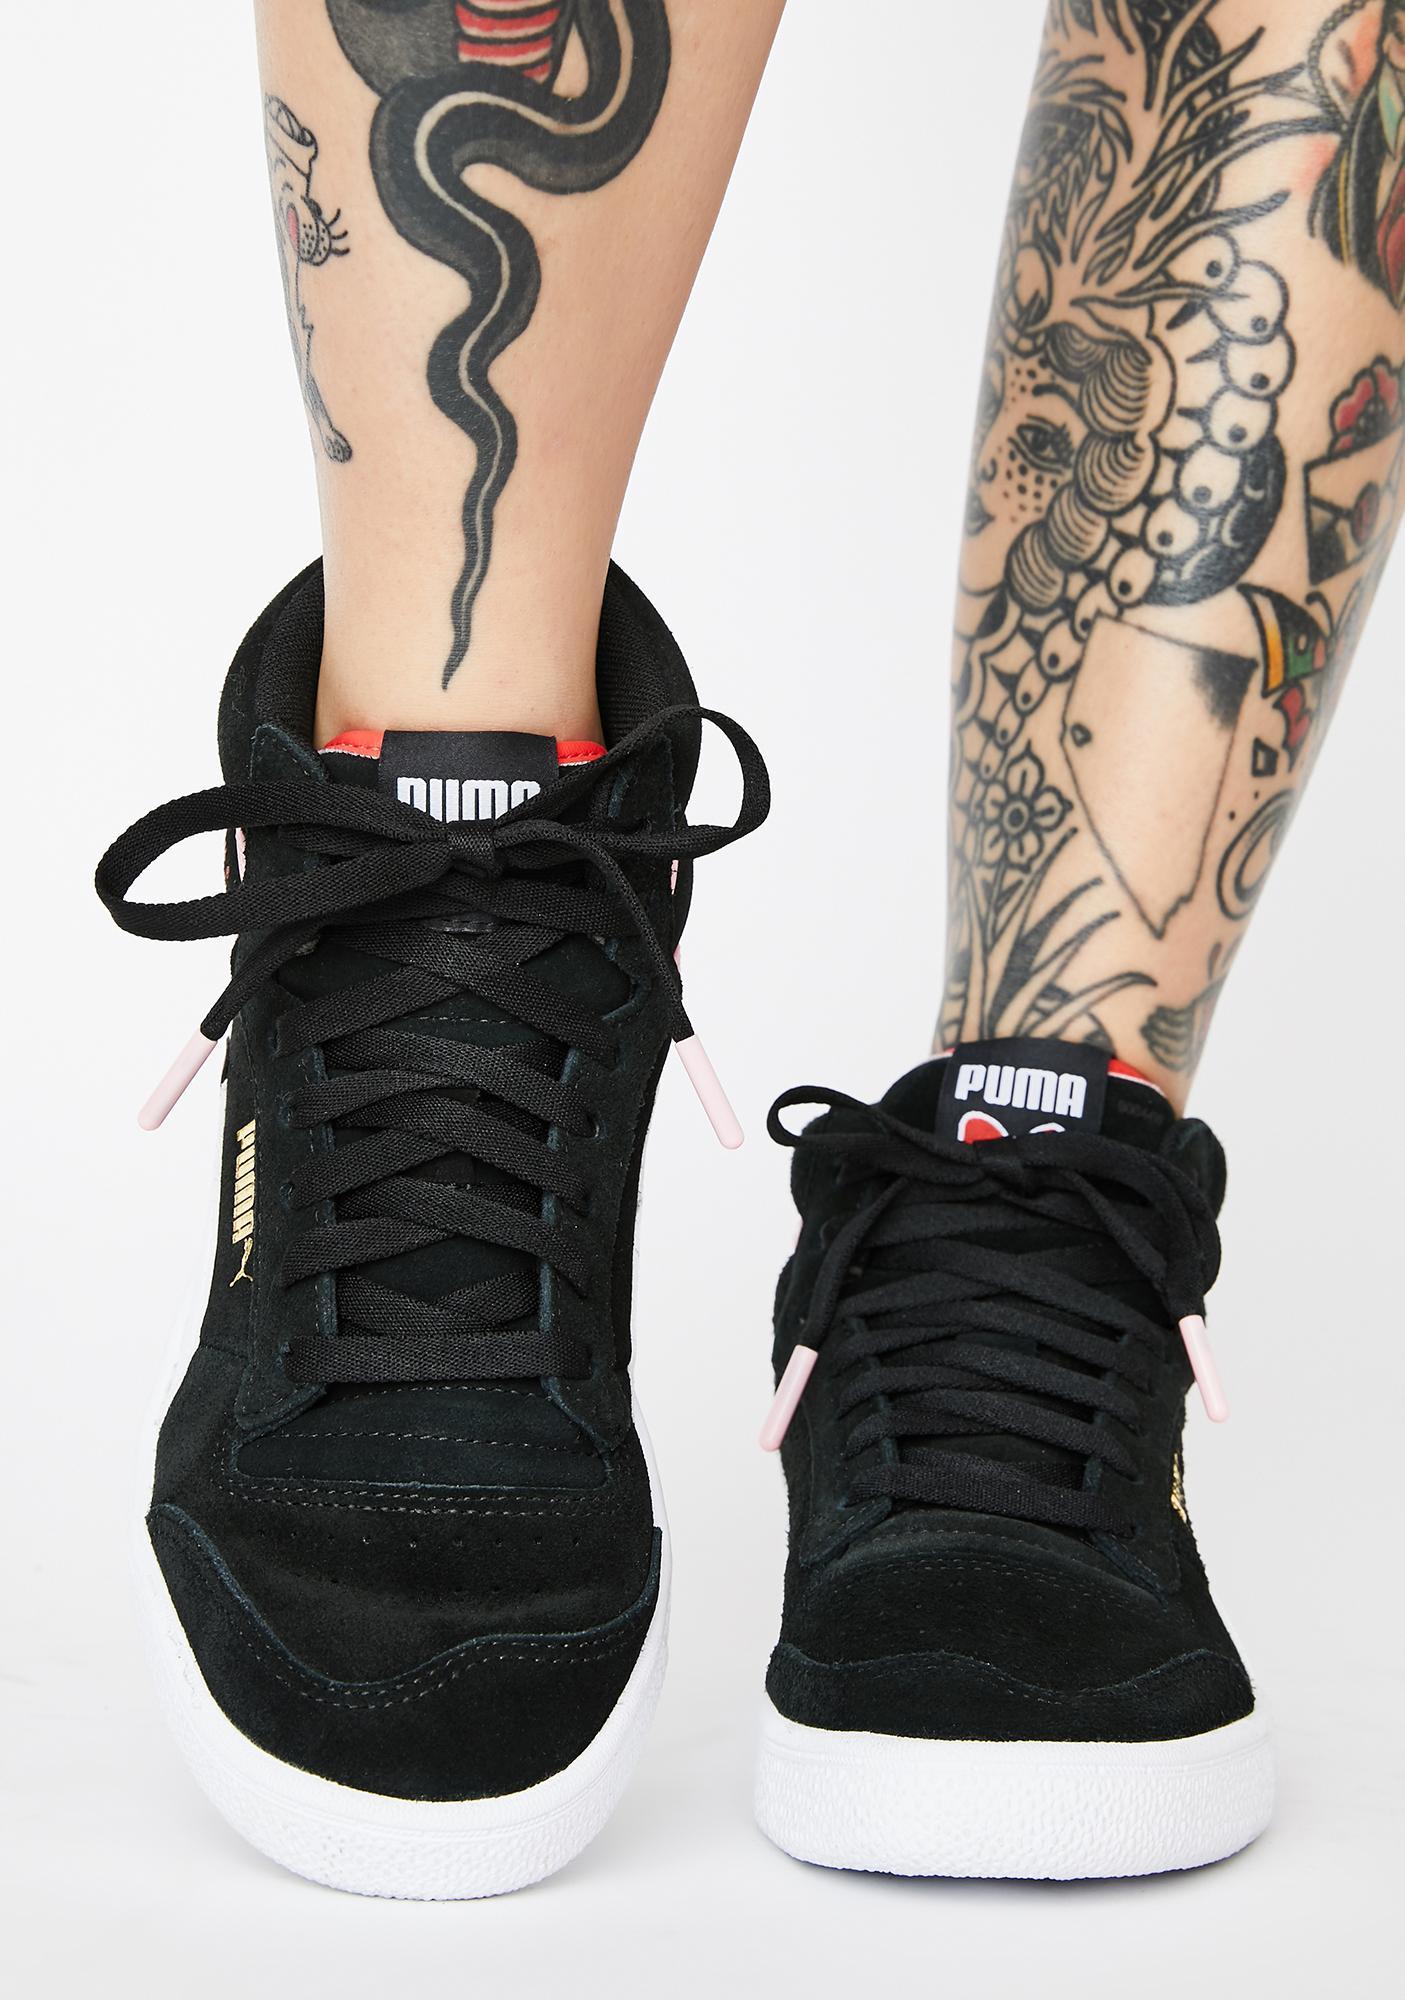 PUMA X Hello Kitty Ralph Sampson Mid Sneakers